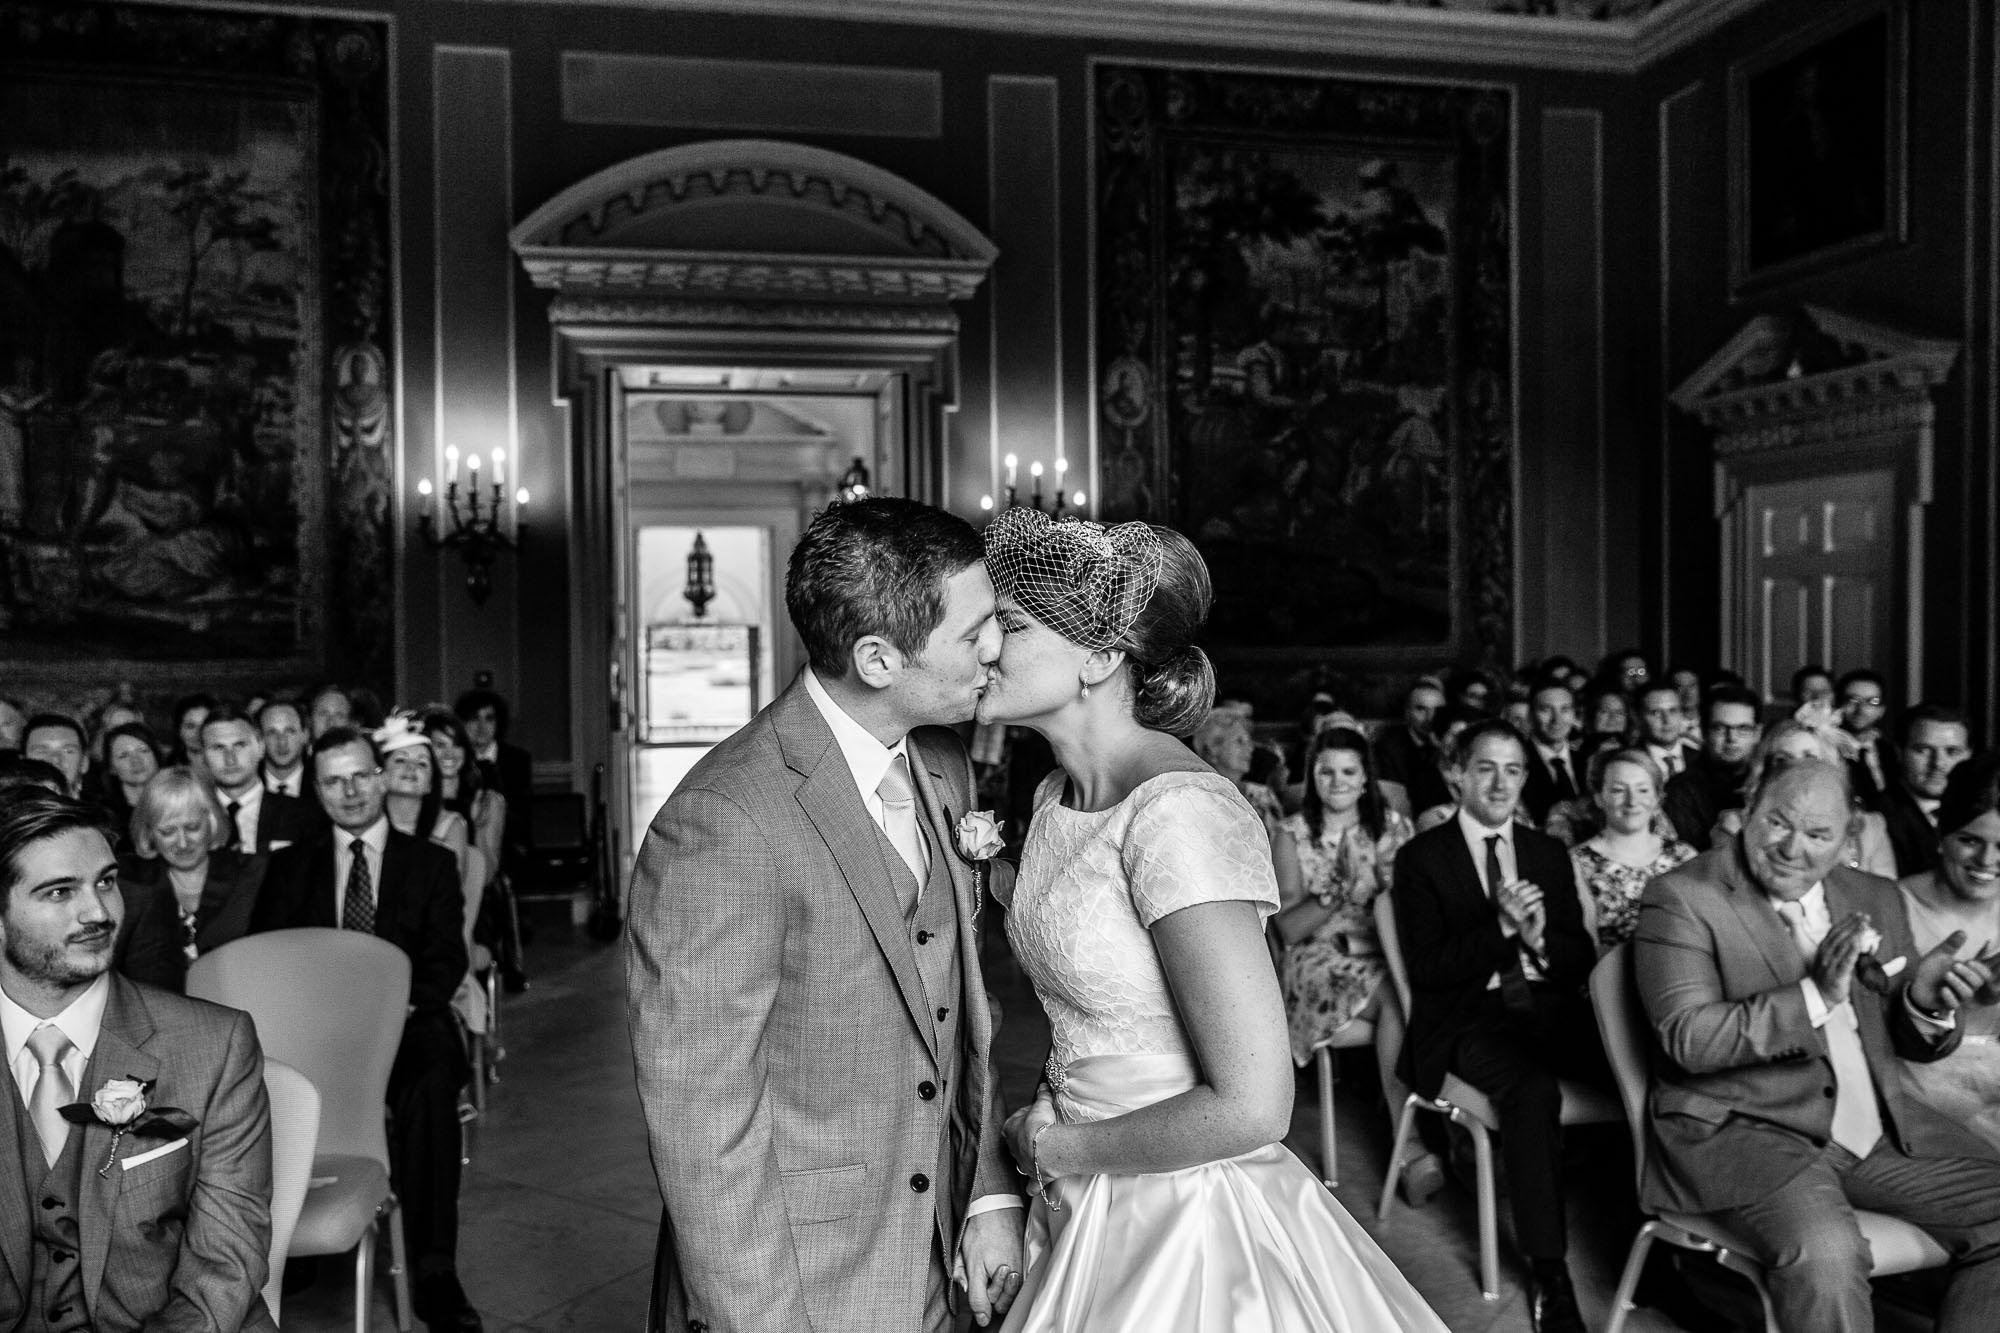 Clandon Park Wedding Photographer 50 5590